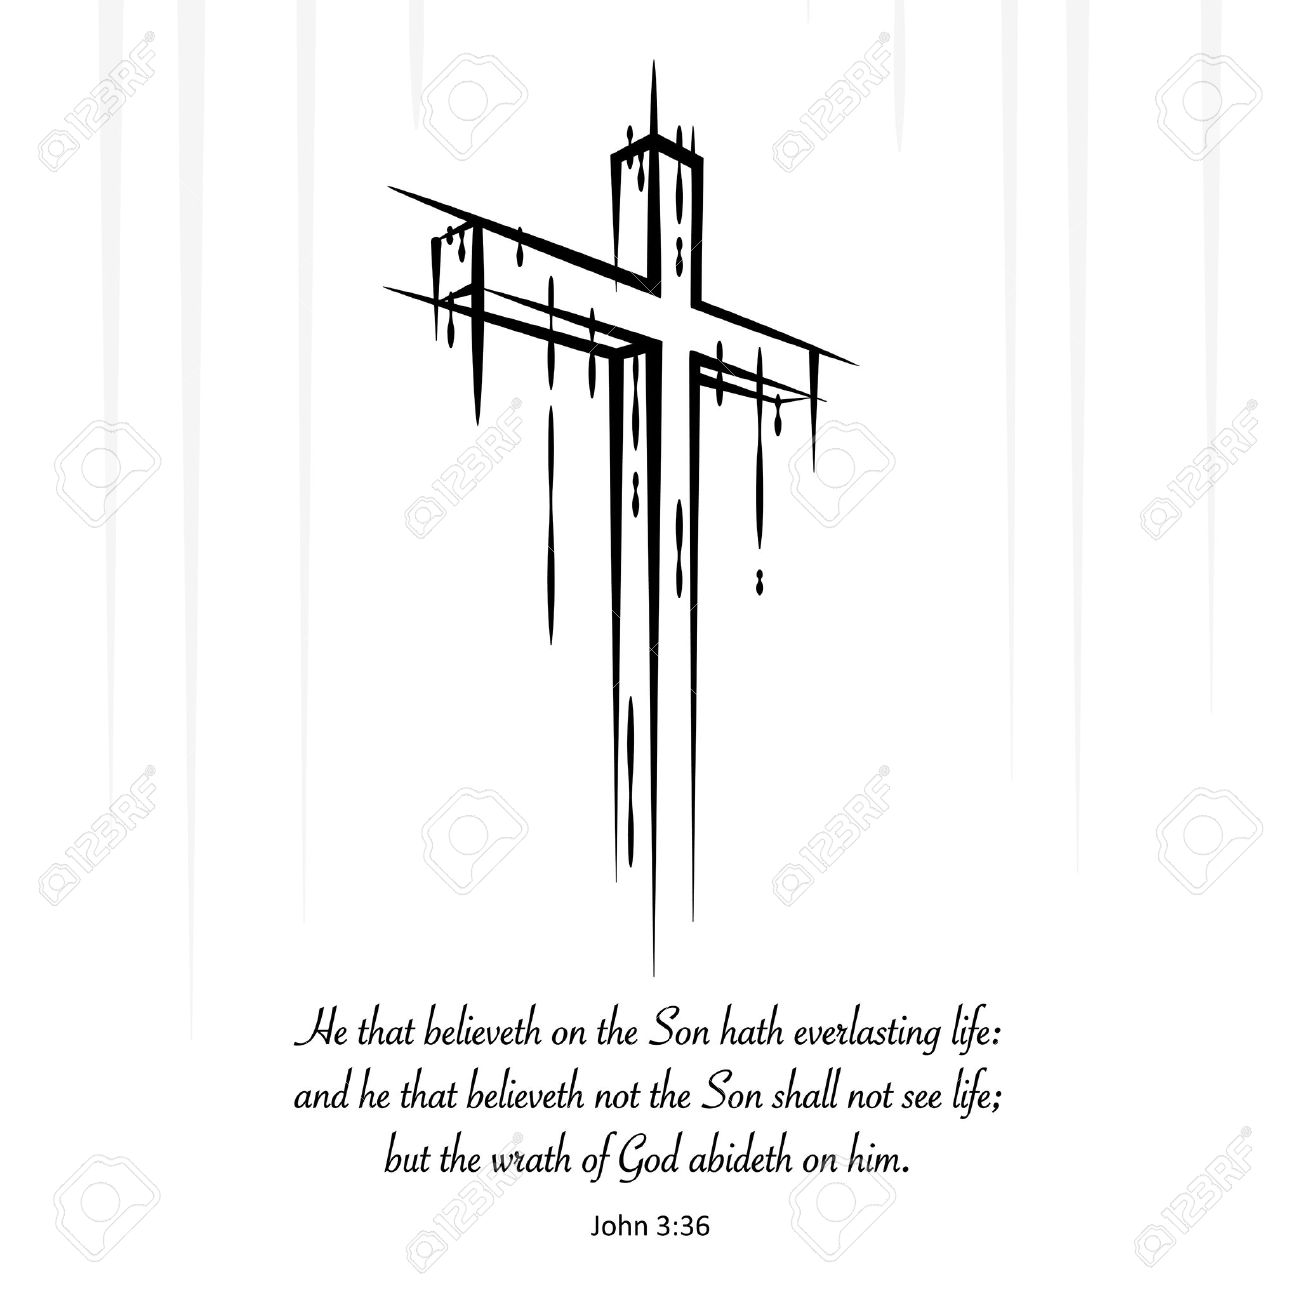 christ jesus cross crucifix sketch with christian new testament